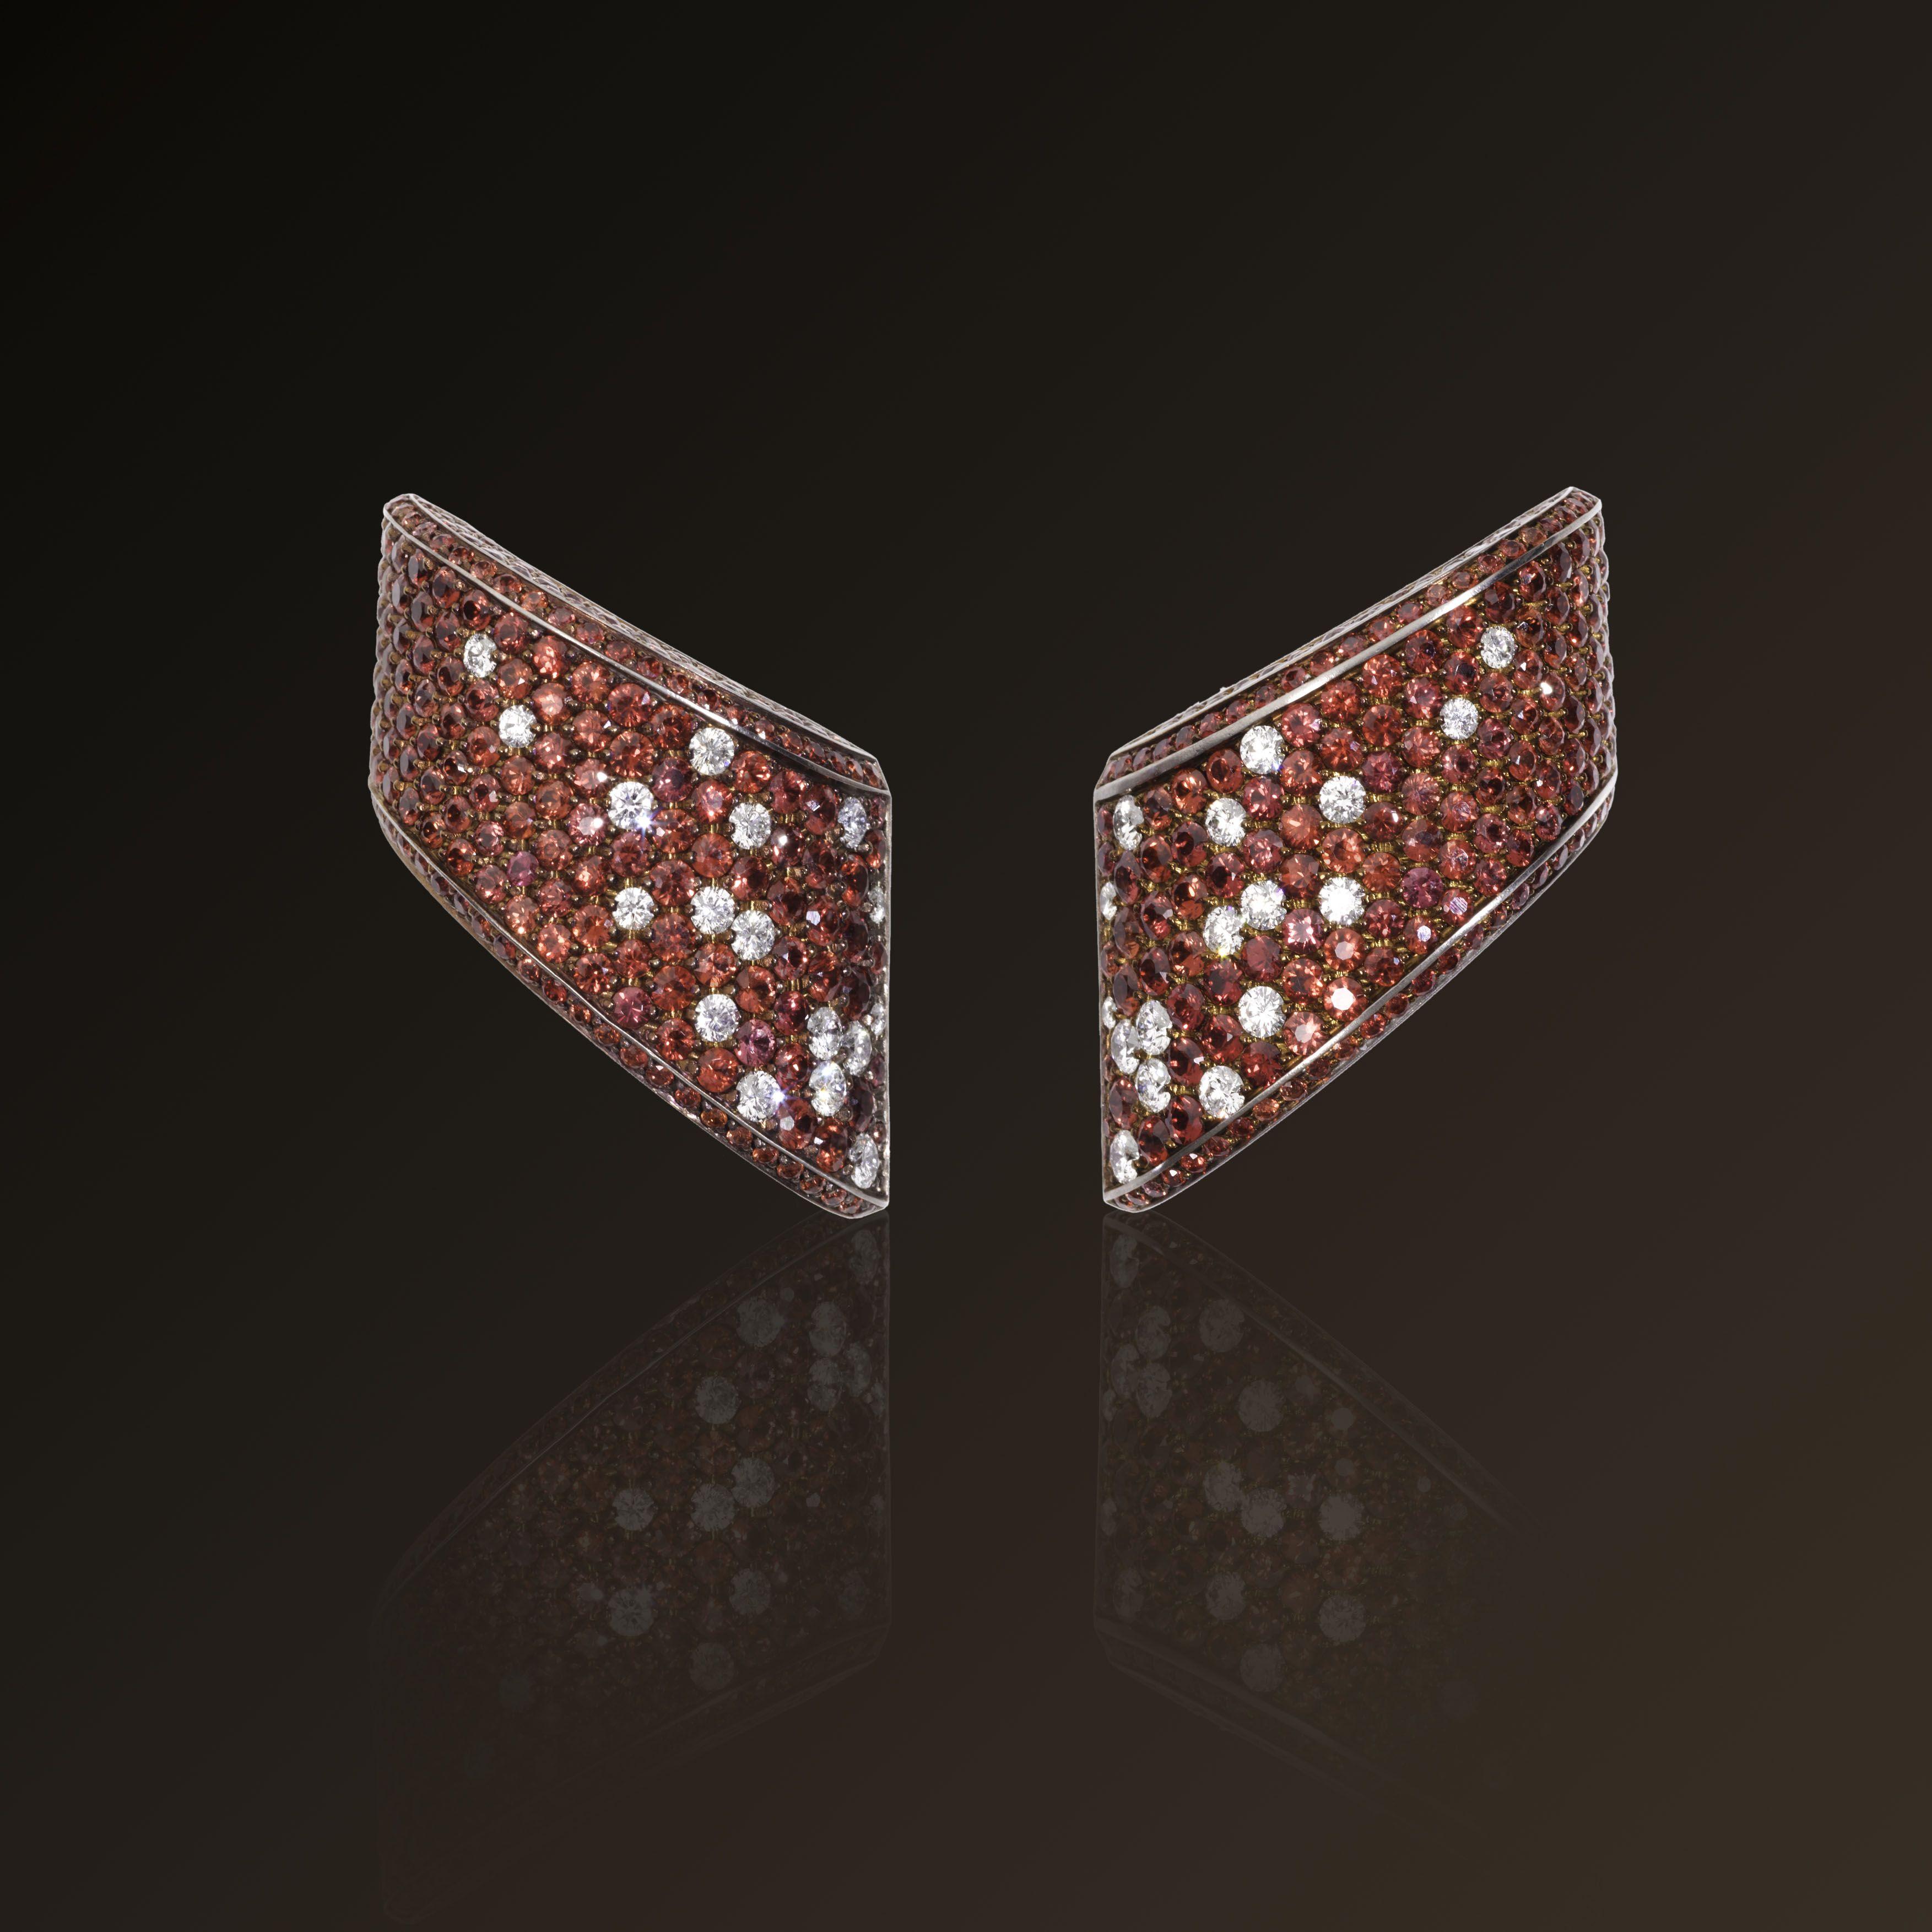 Volta Celeste - Vhernier Earclips in titanium, diamonds and cognac sapphires